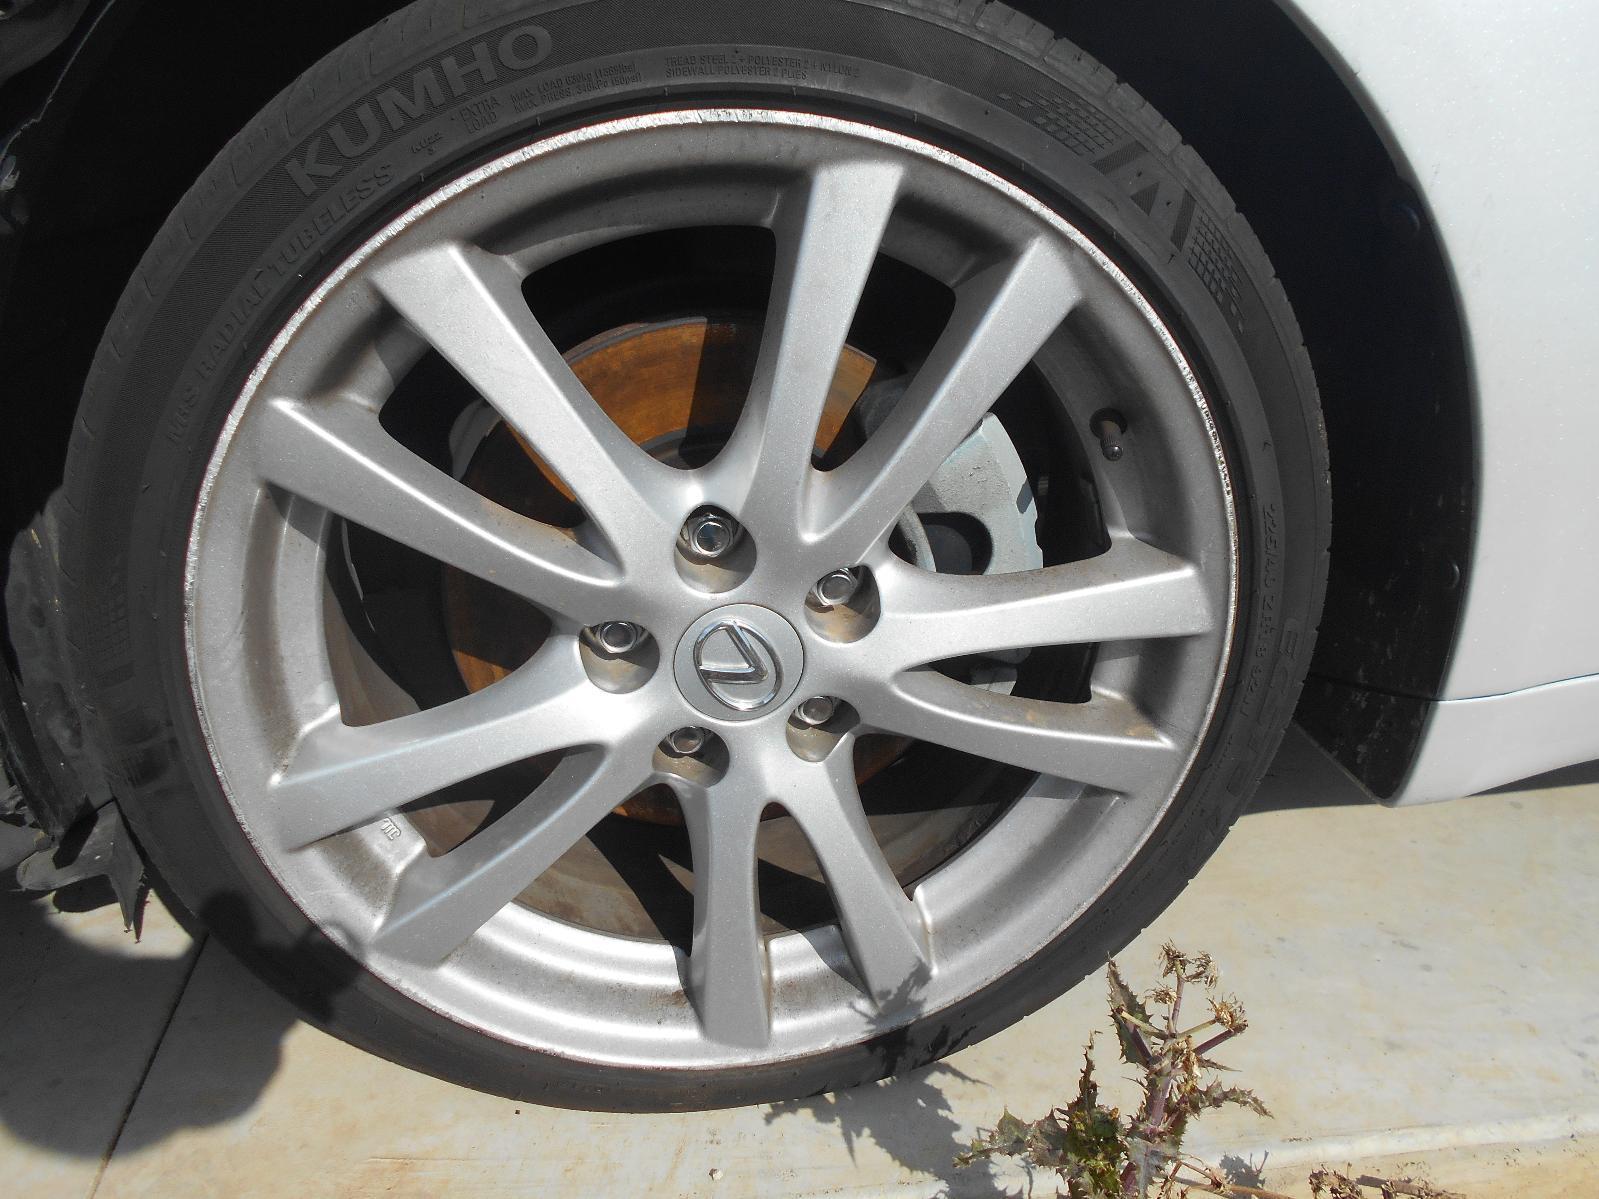 LEXUS IS250/IS250C, Wheel Mag, IS250, FACTORY, FRONT, 18X8IN, TWIN SPOKE, GSE20R, 11/05-09/08